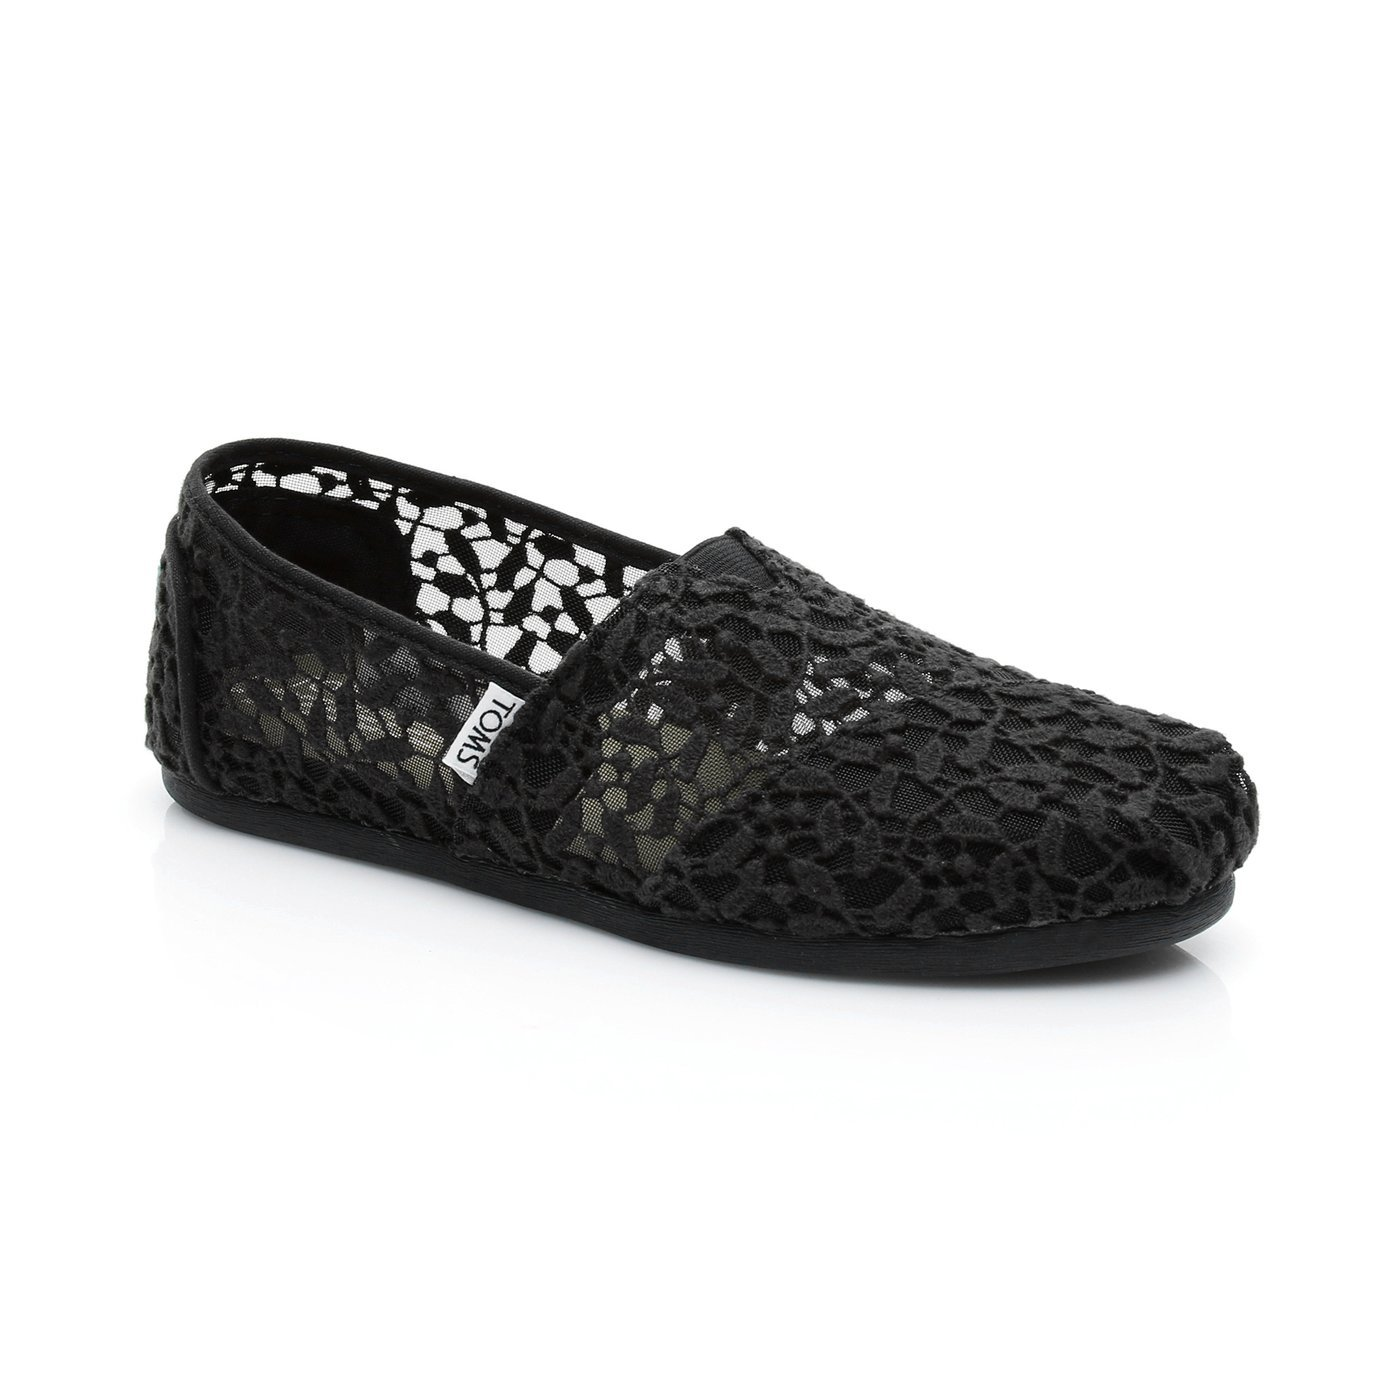 Toms Classic Lace Leaves Kadın Siyah Espadril Kadin Espadril 3444927 | SuperStep